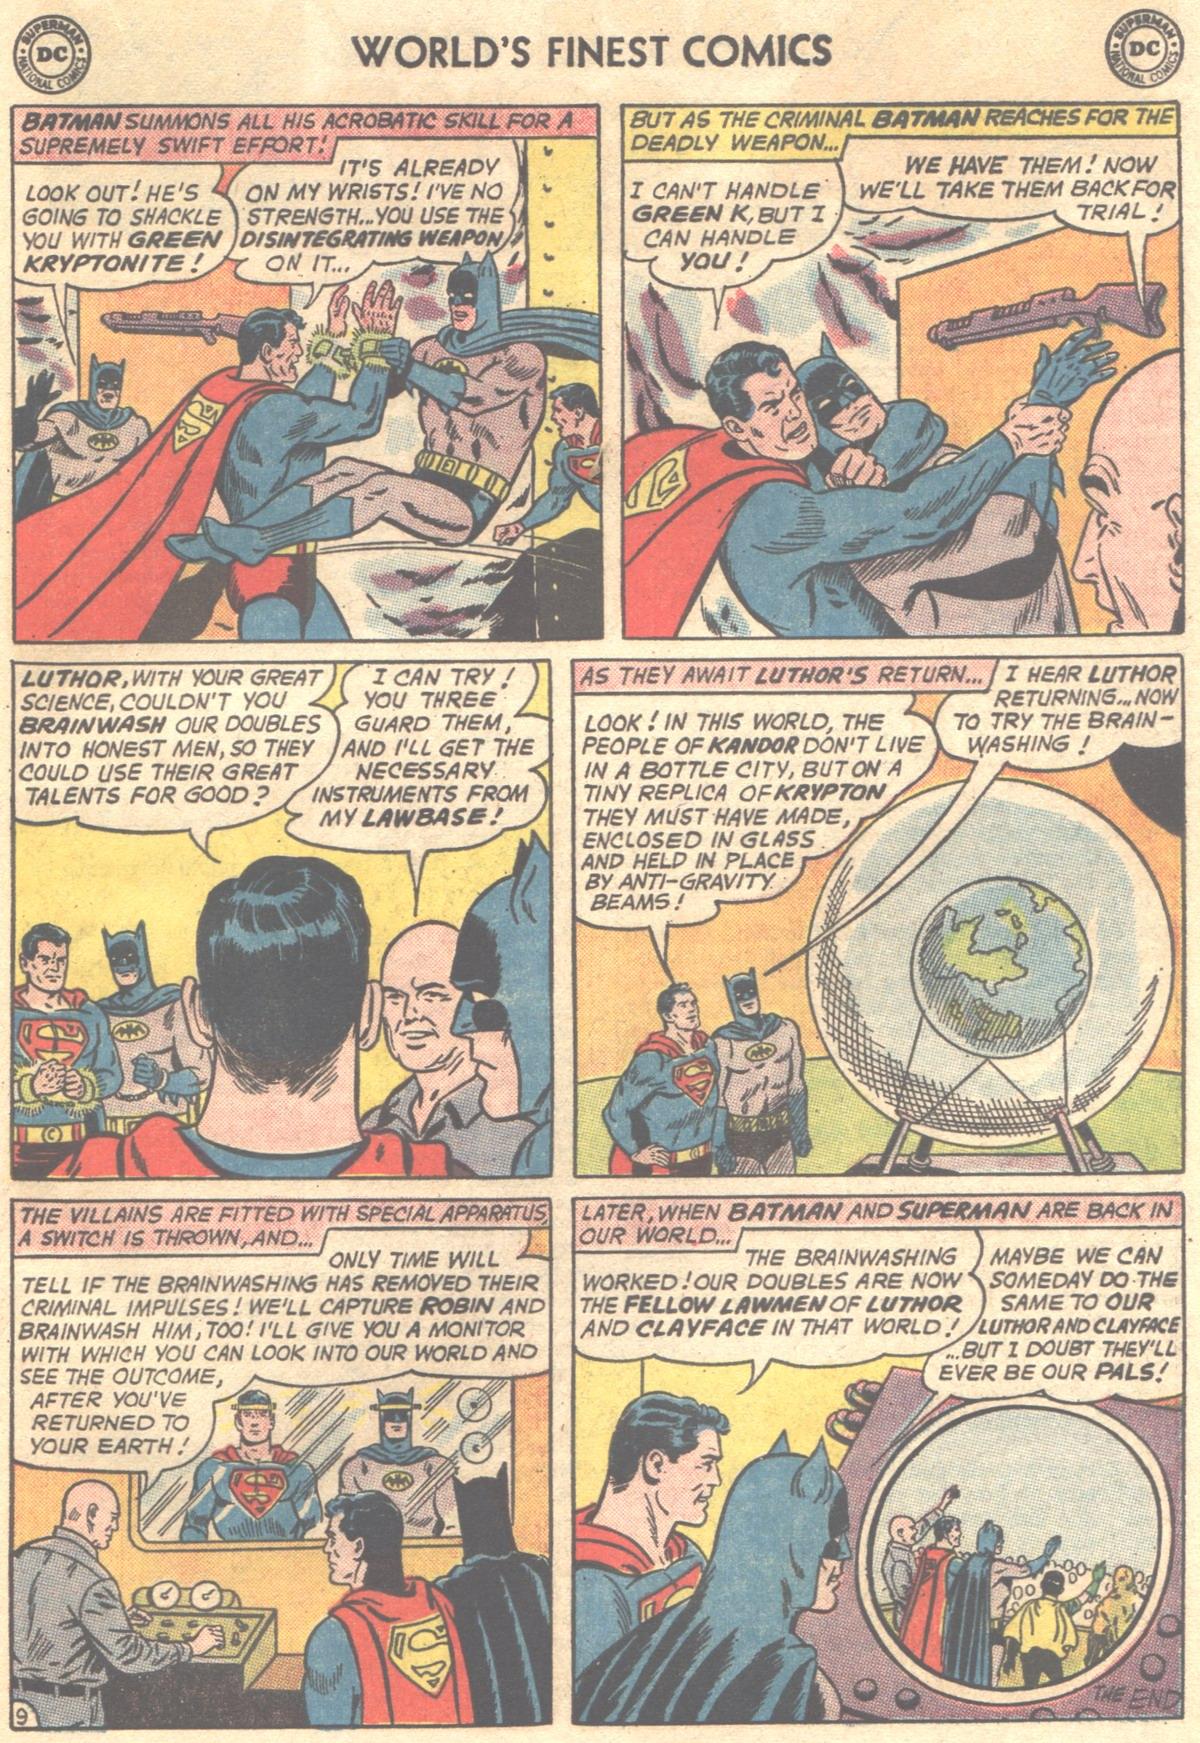 Read online World's Finest Comics comic -  Issue #148 - 21